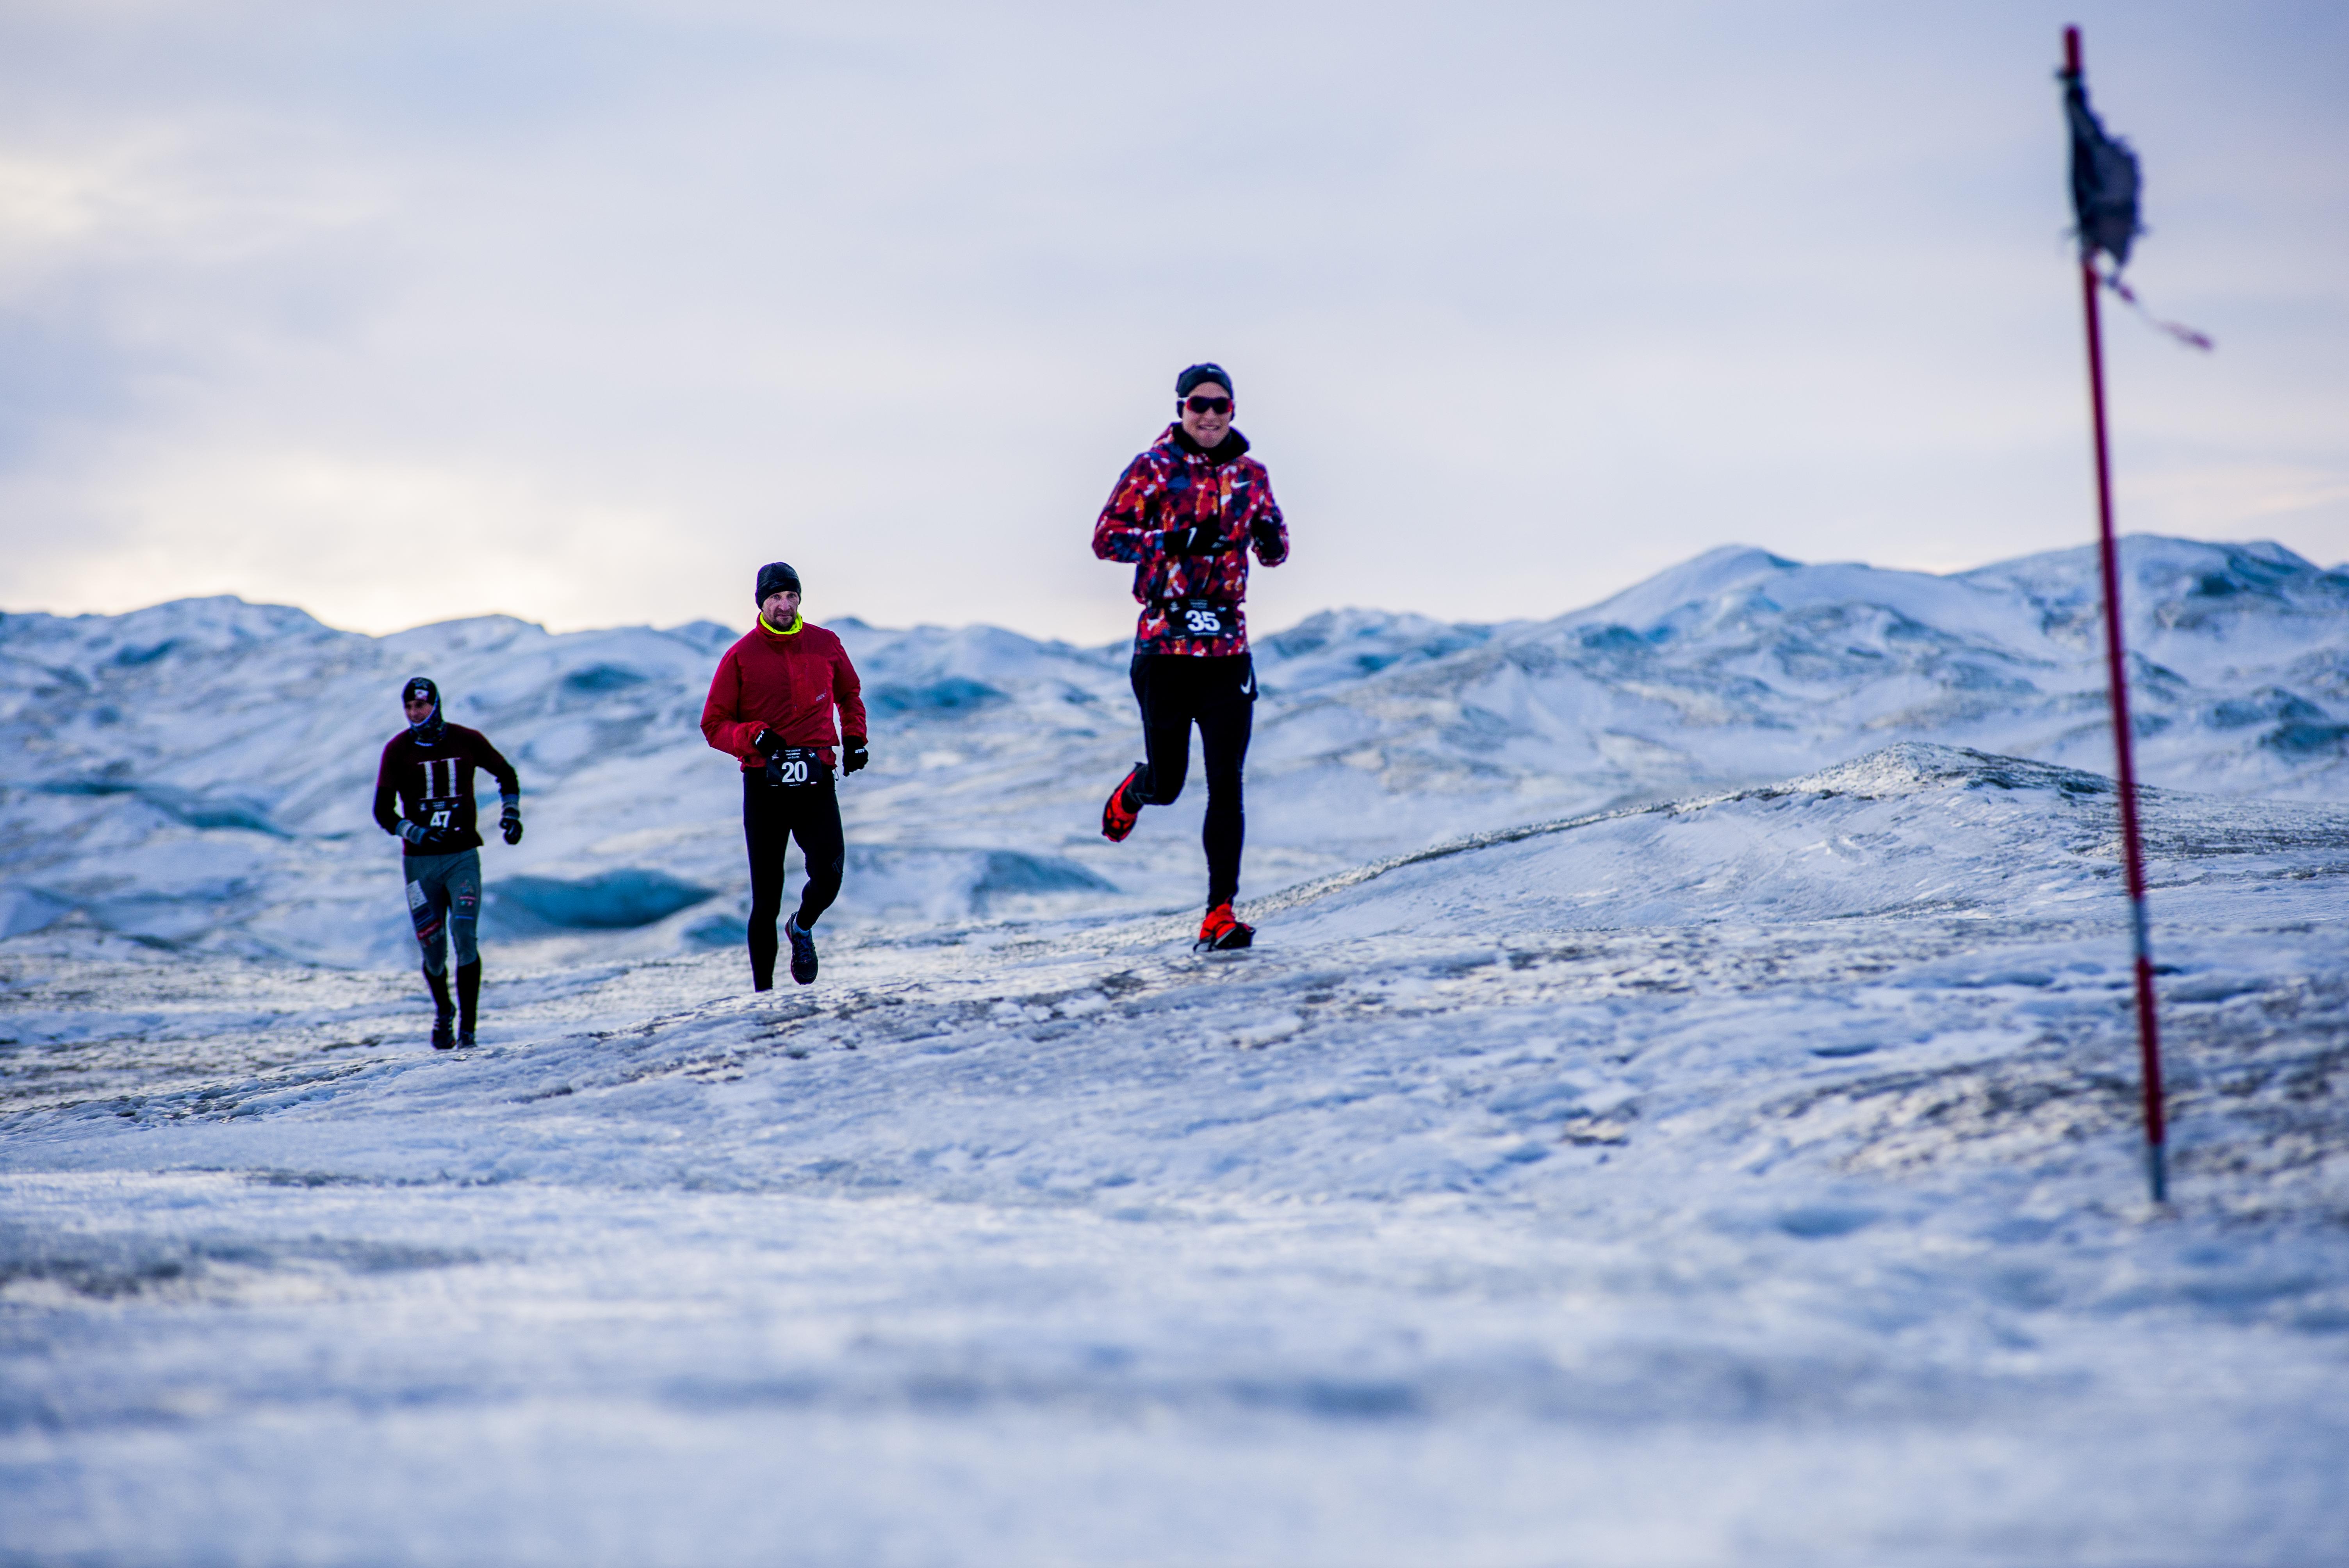 Arctic race 2020